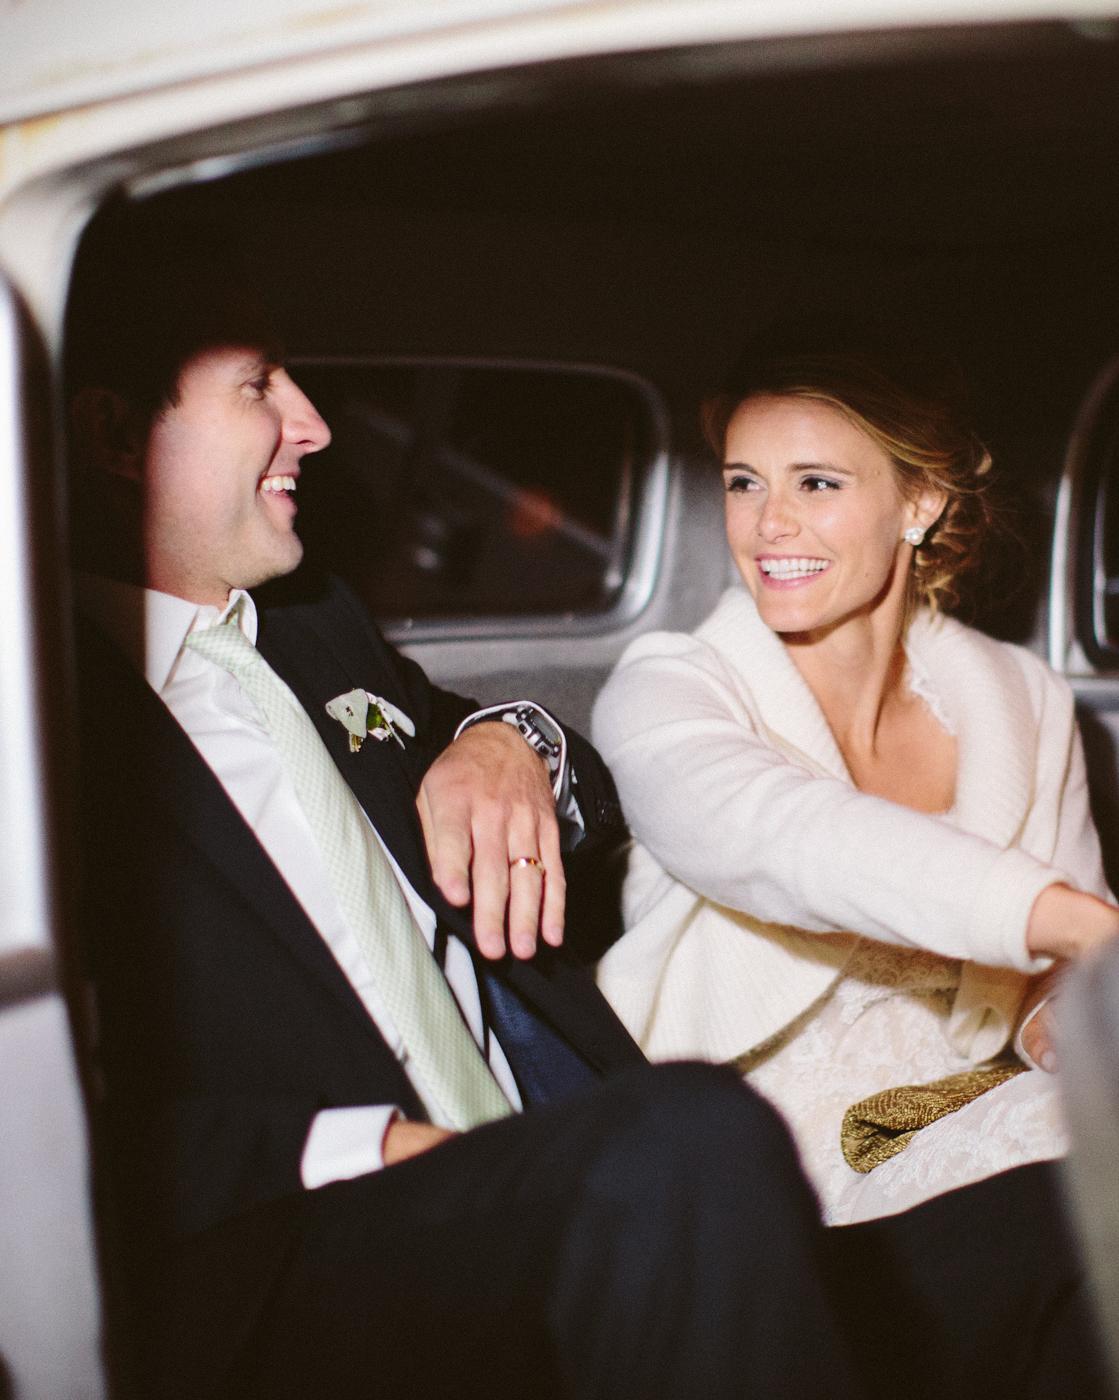 jamie-alex-wedding-car-327-s111544-1014.jpg